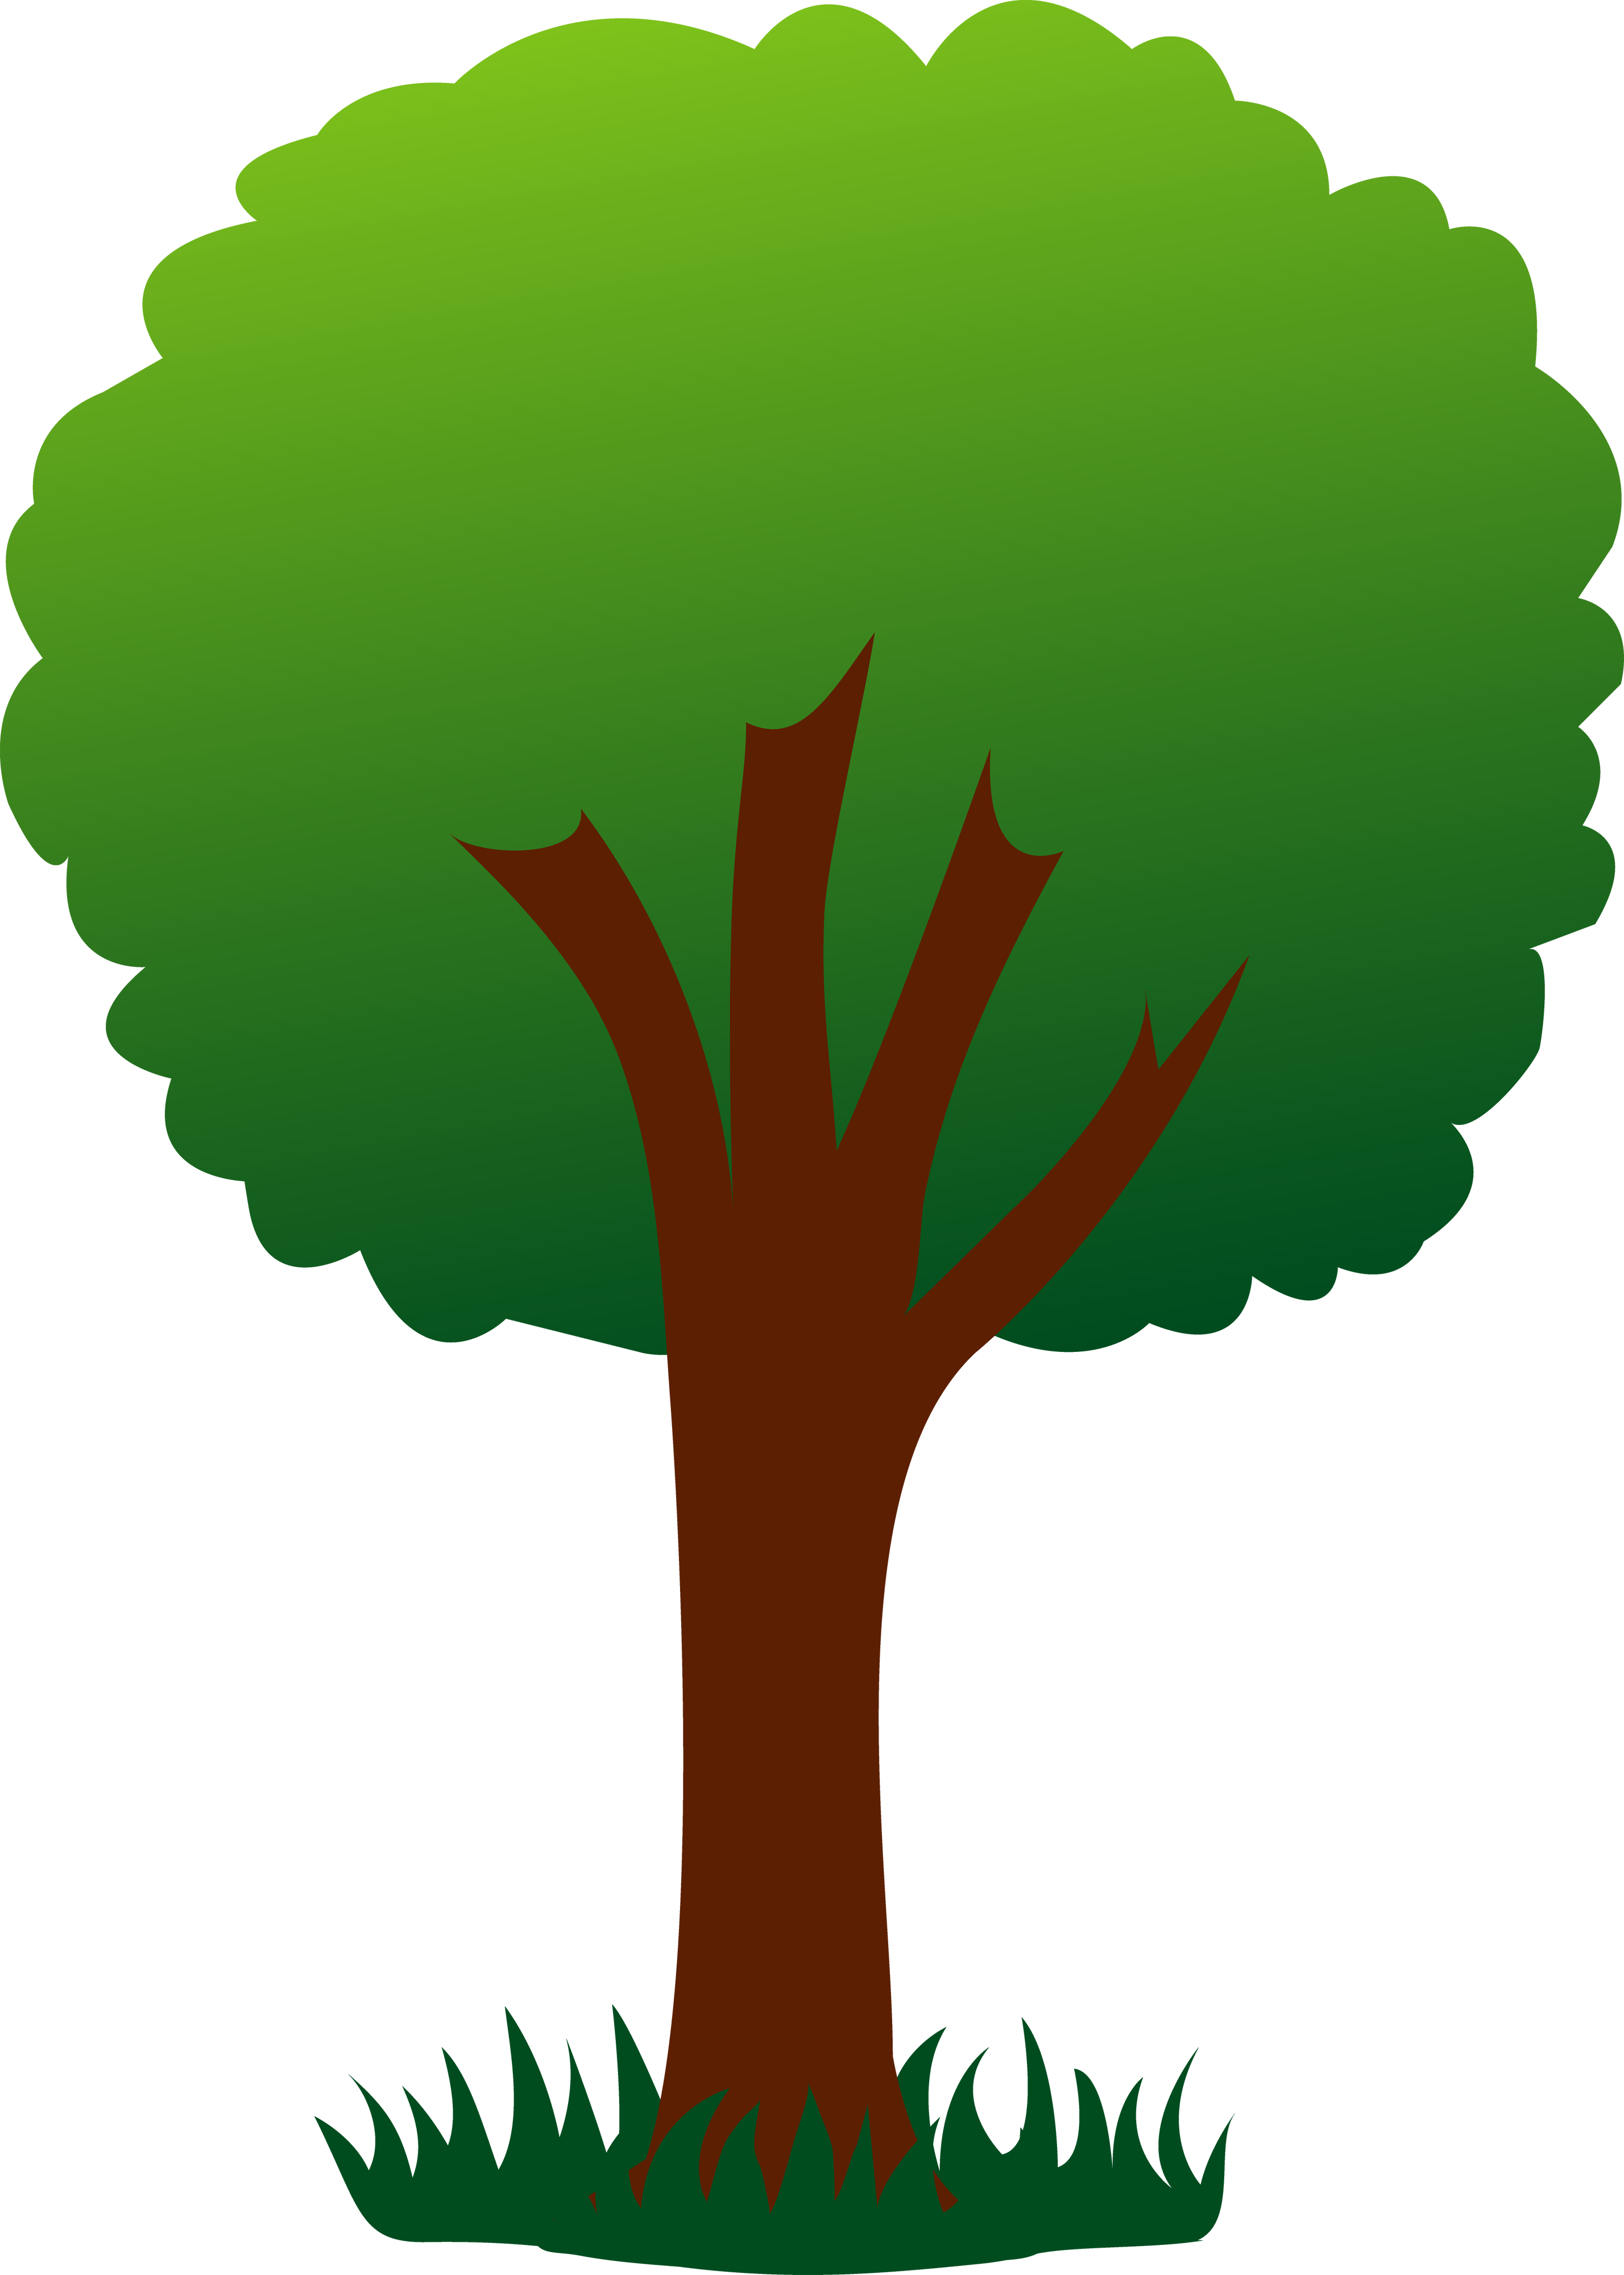 Family Tree Clipart Clipart .-Family Tree Clipart Clipart .-8